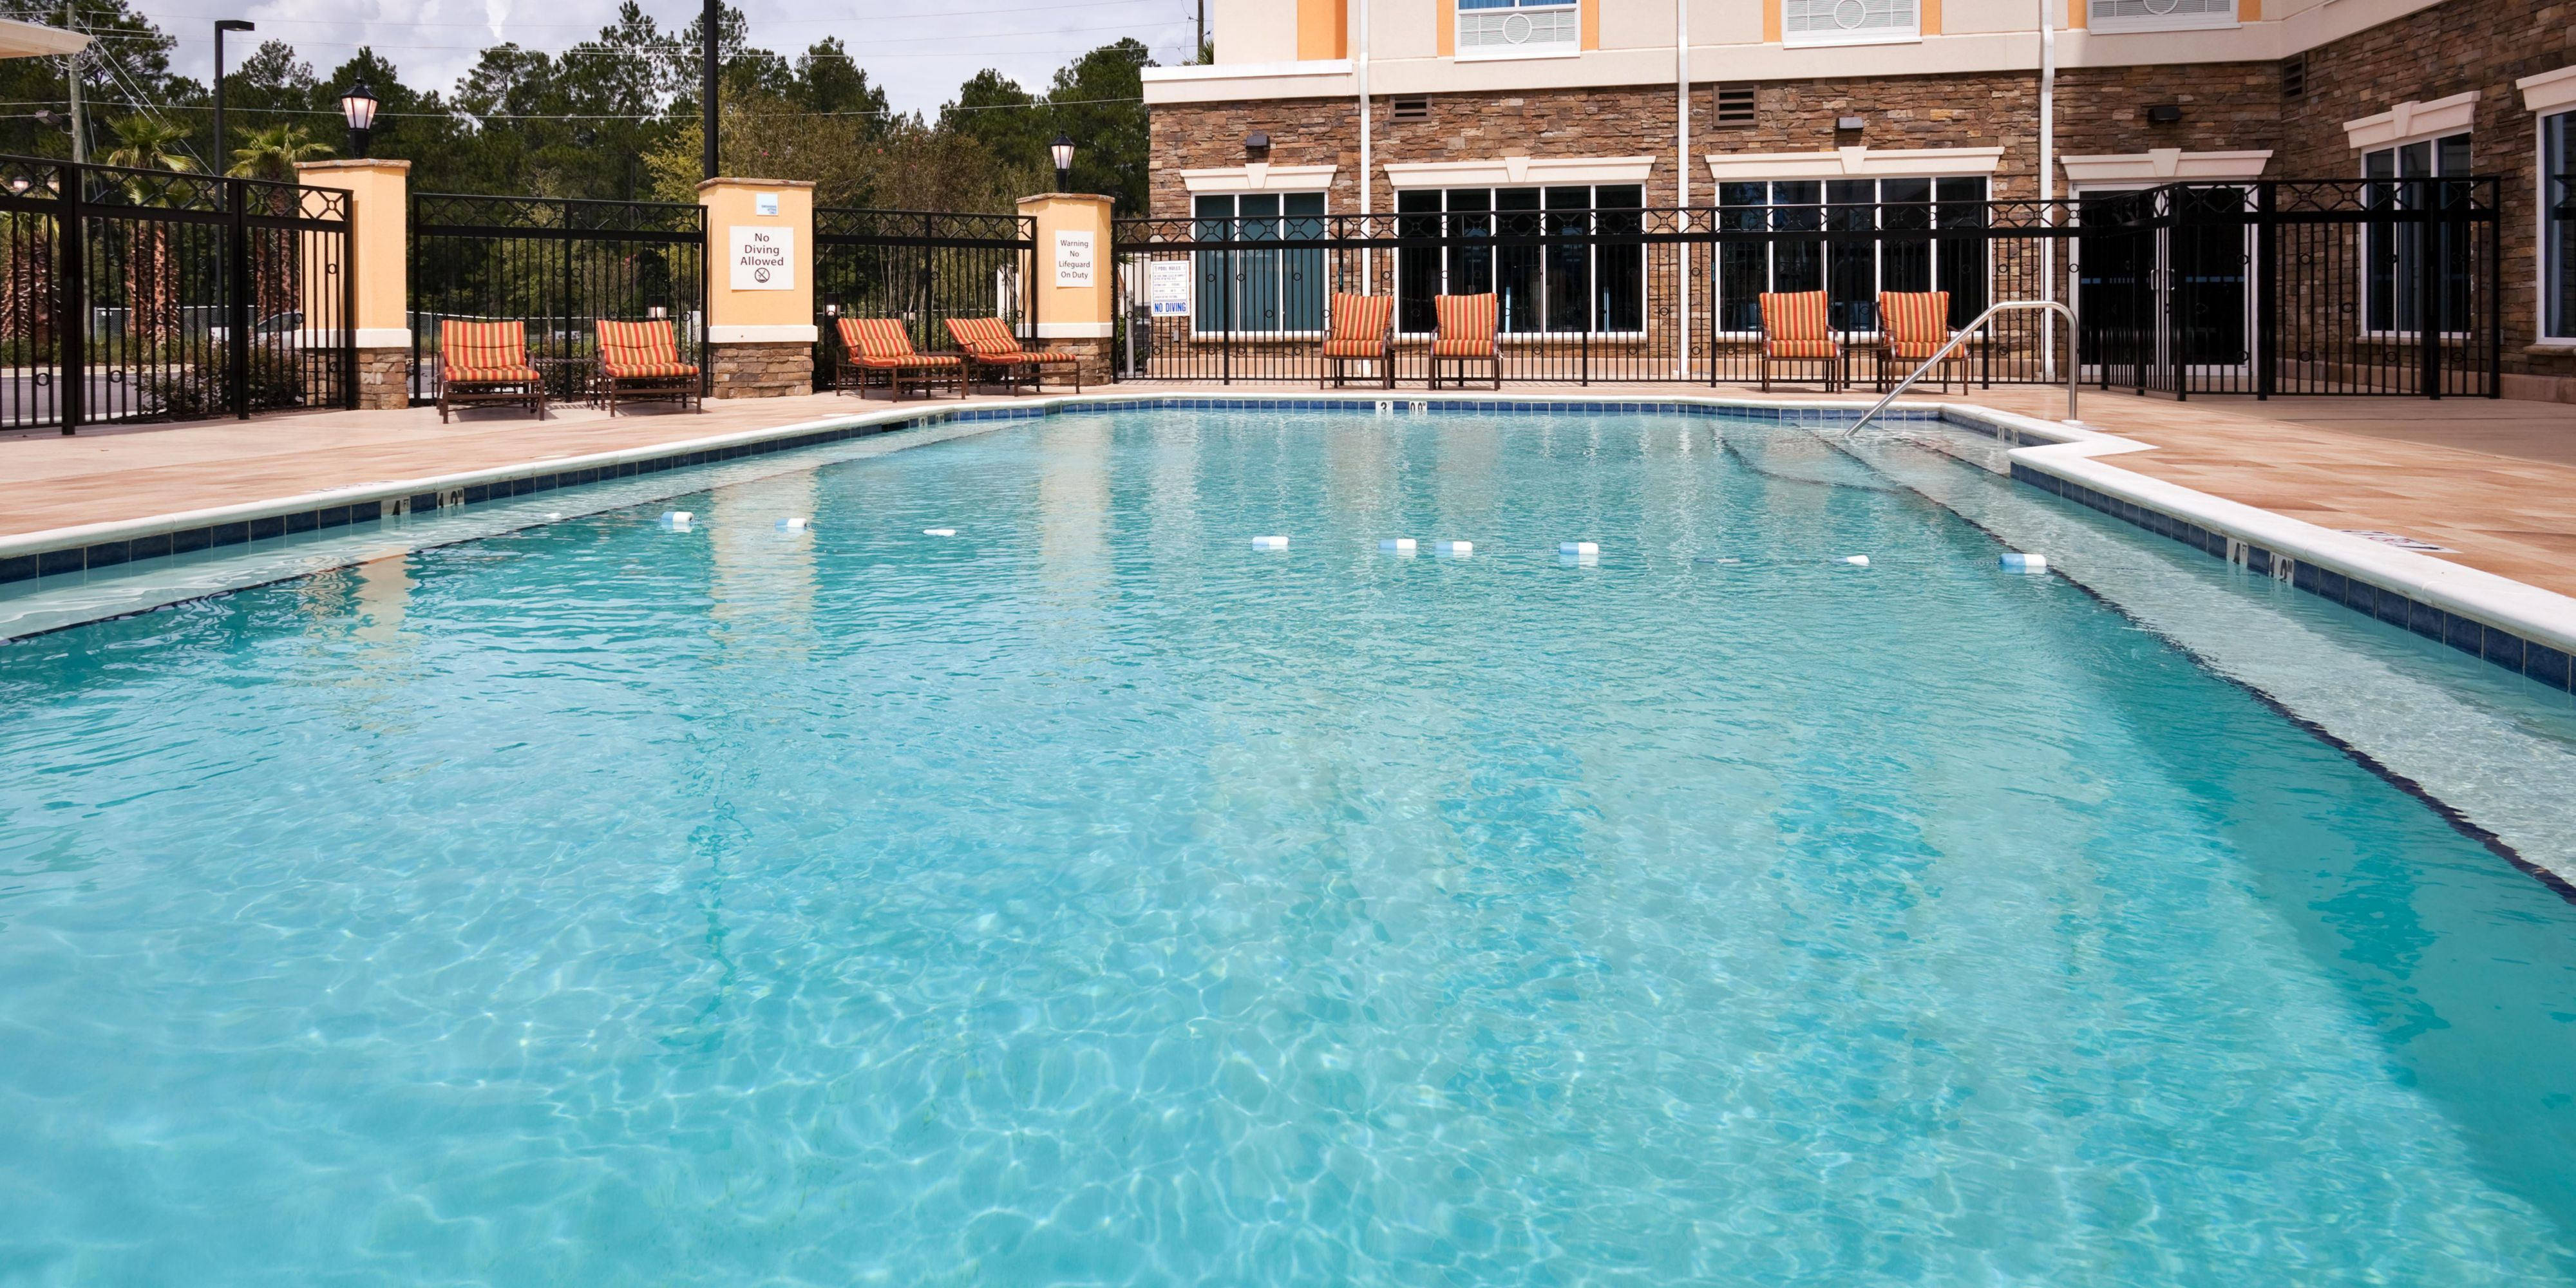 Alabama mobile county saraland - Holiday Inn Express And Suites Saraland 2532820271 2x1